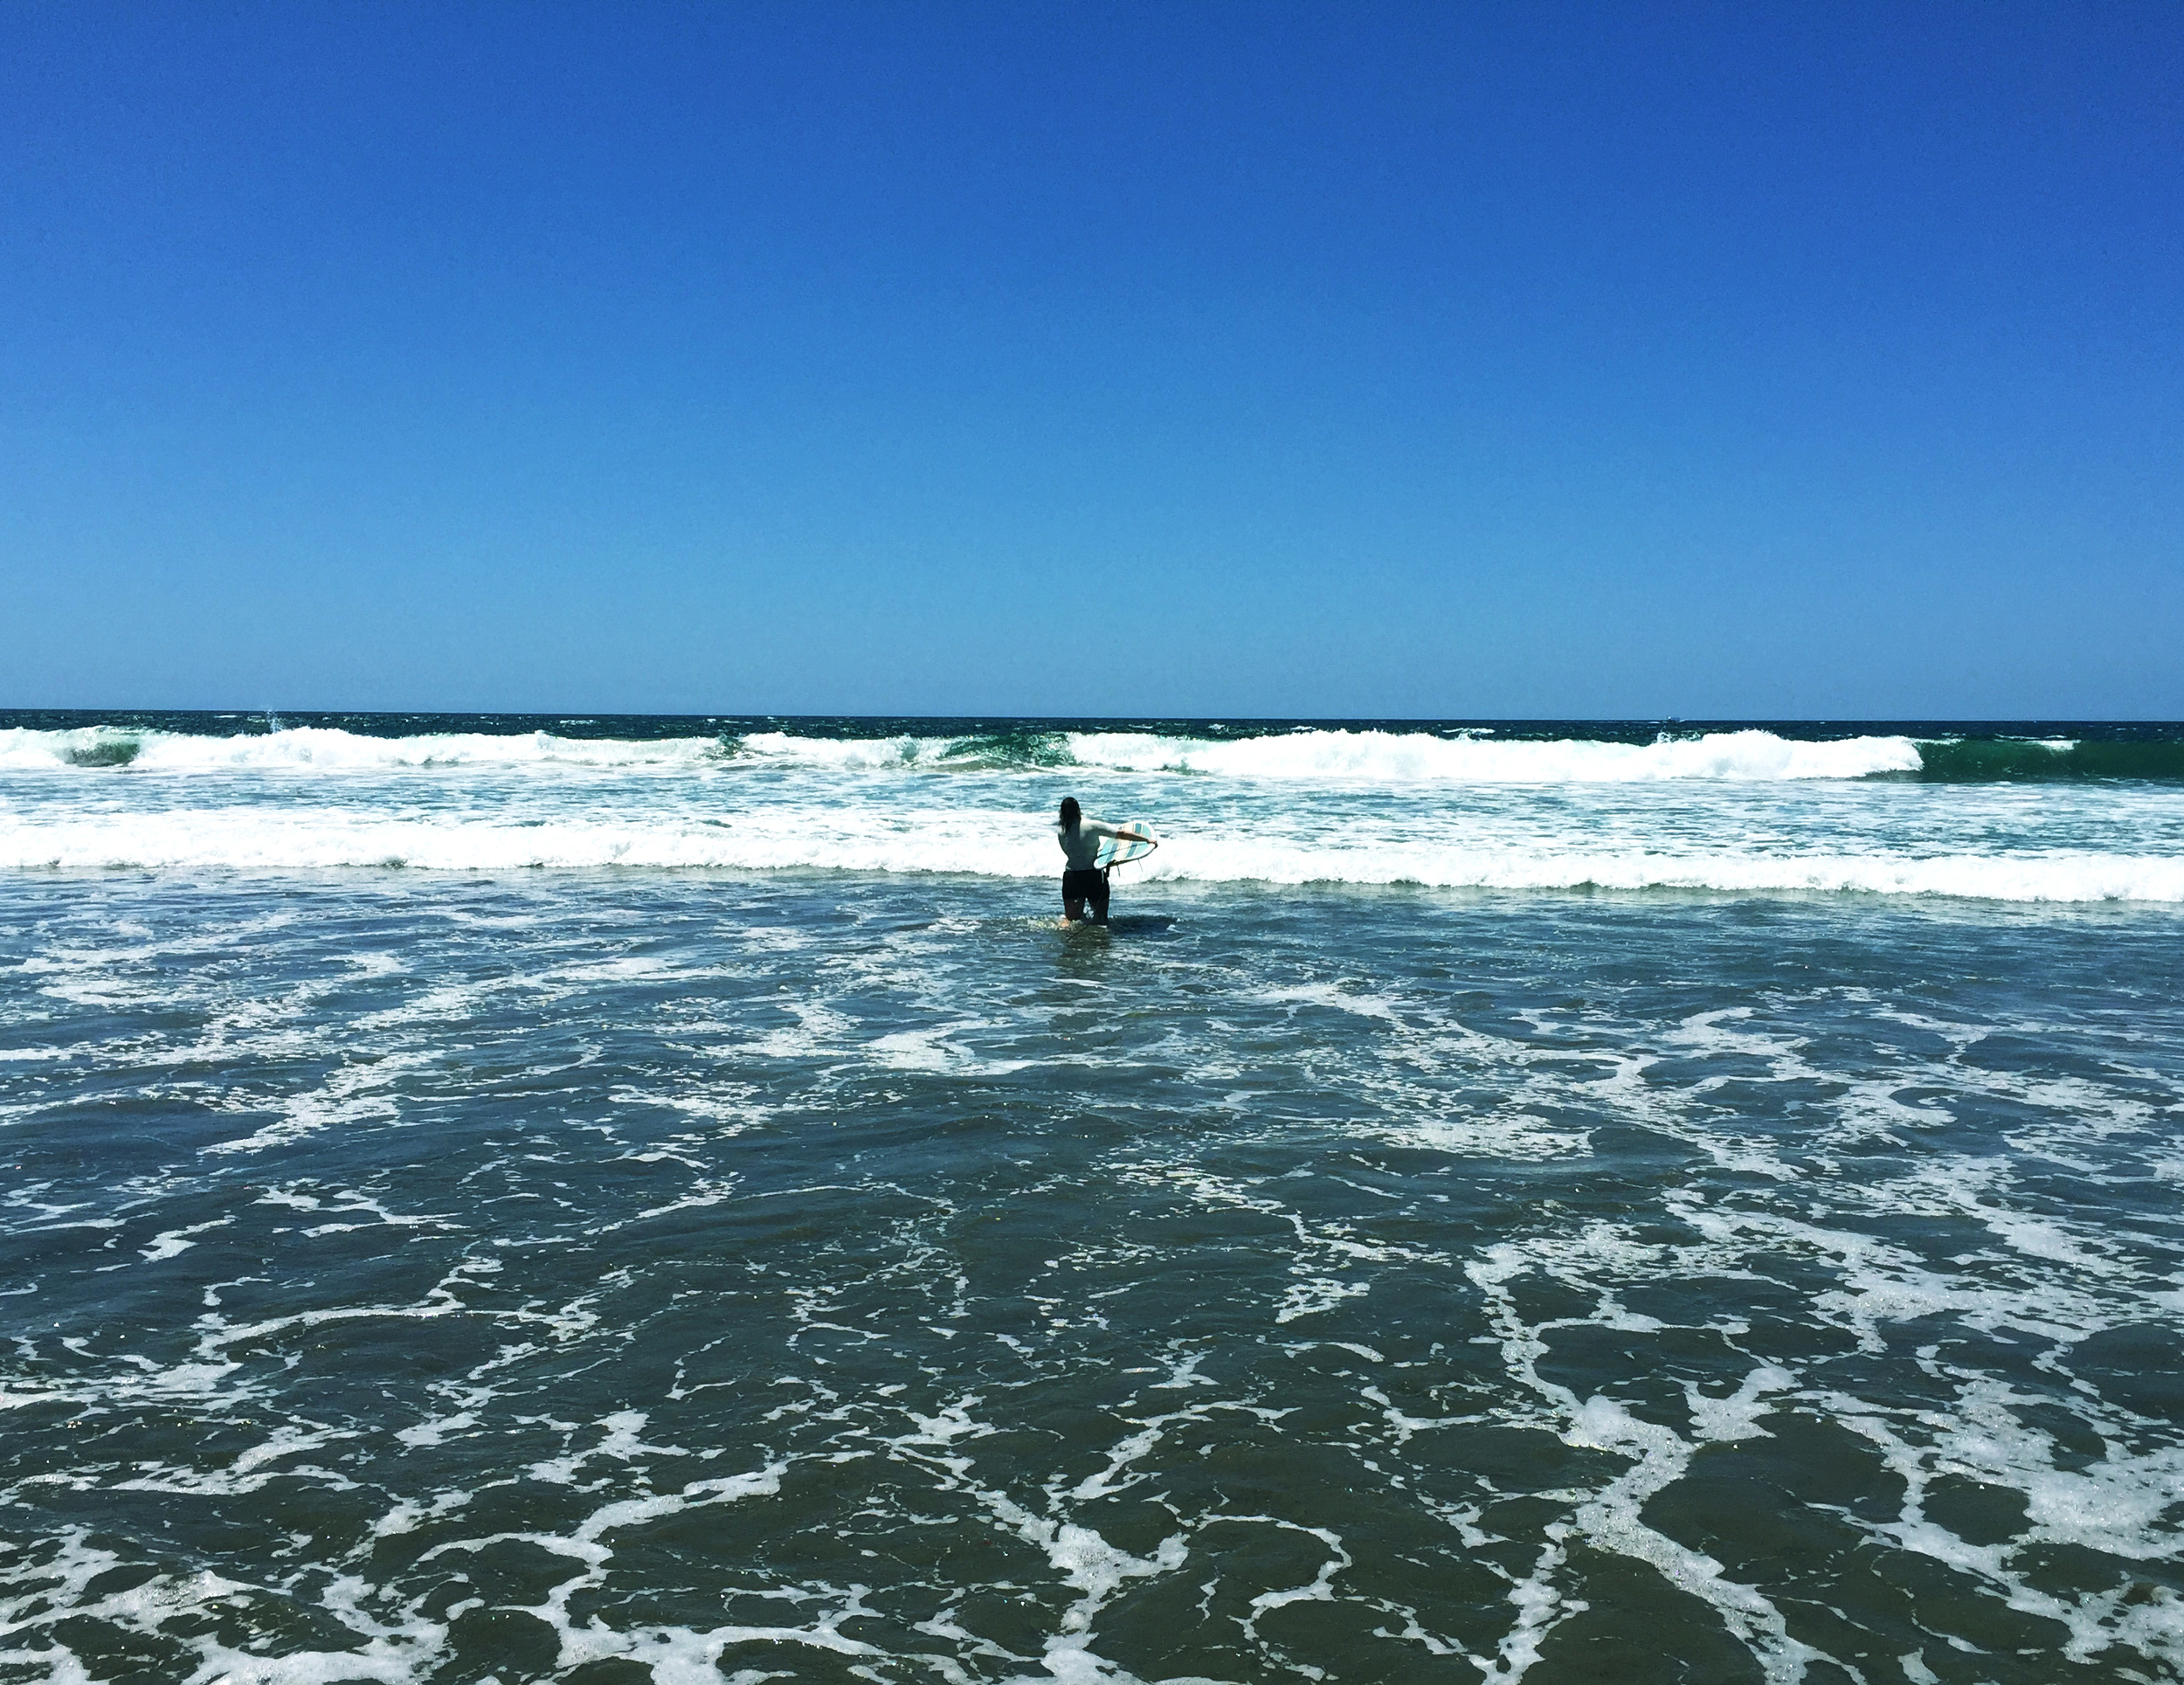 Surfing Playa Negra's Sandy beach